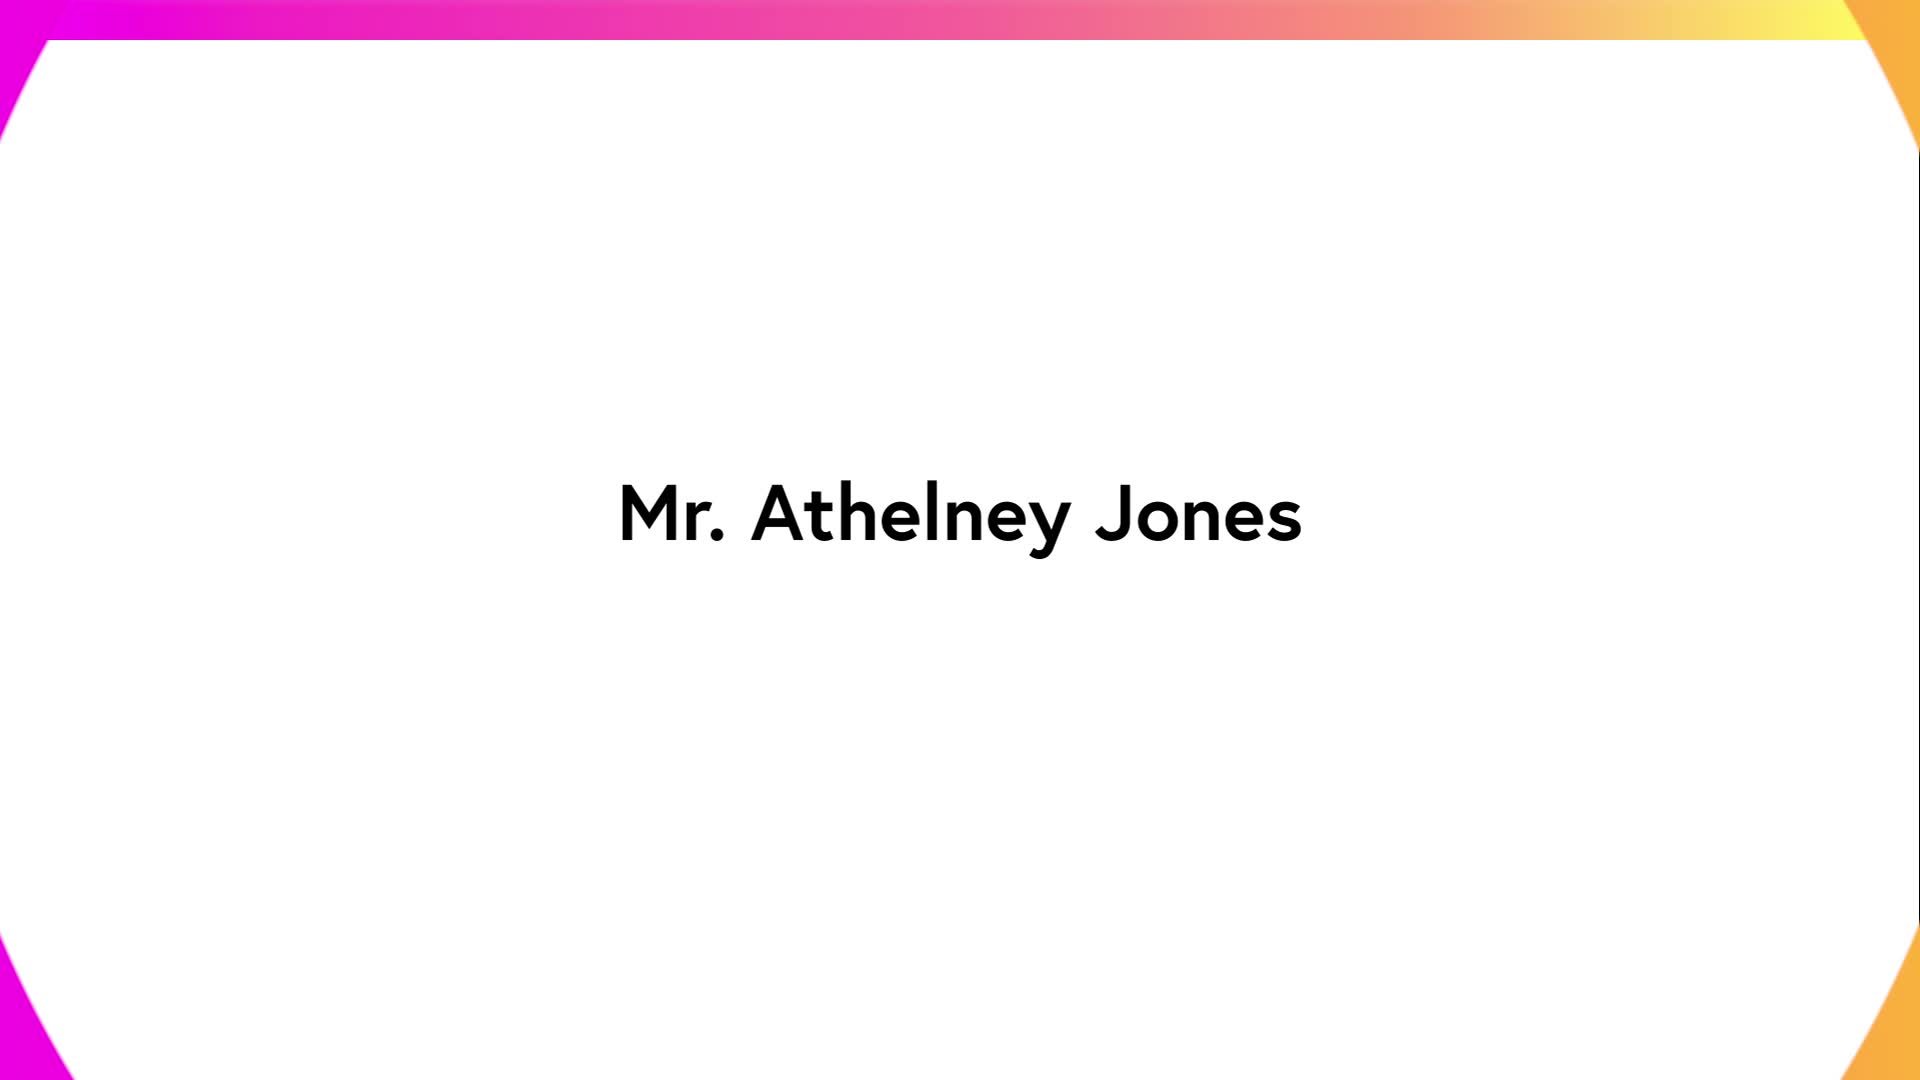 Mr Athelney Jones